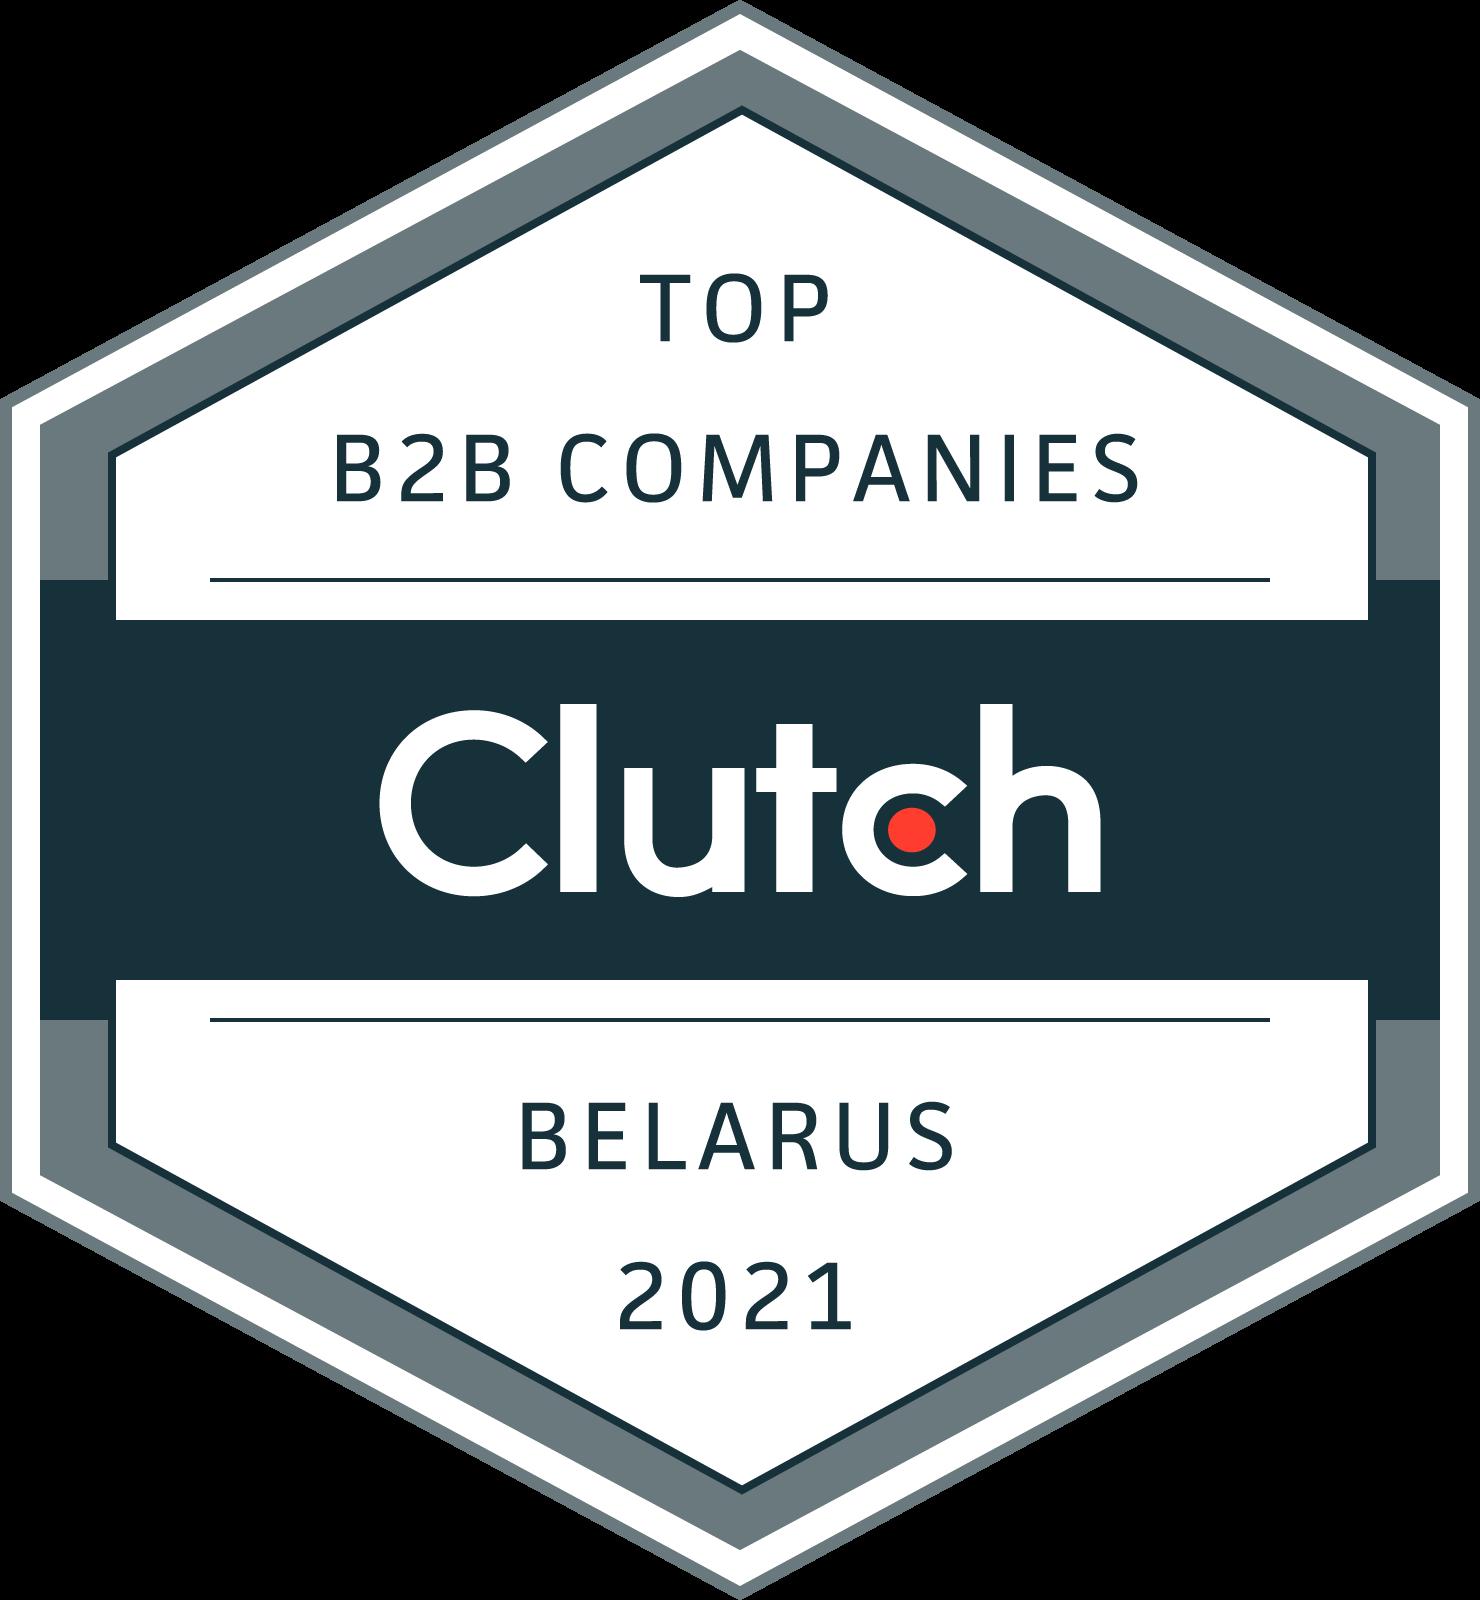 top iot companies in belarus by Clutch